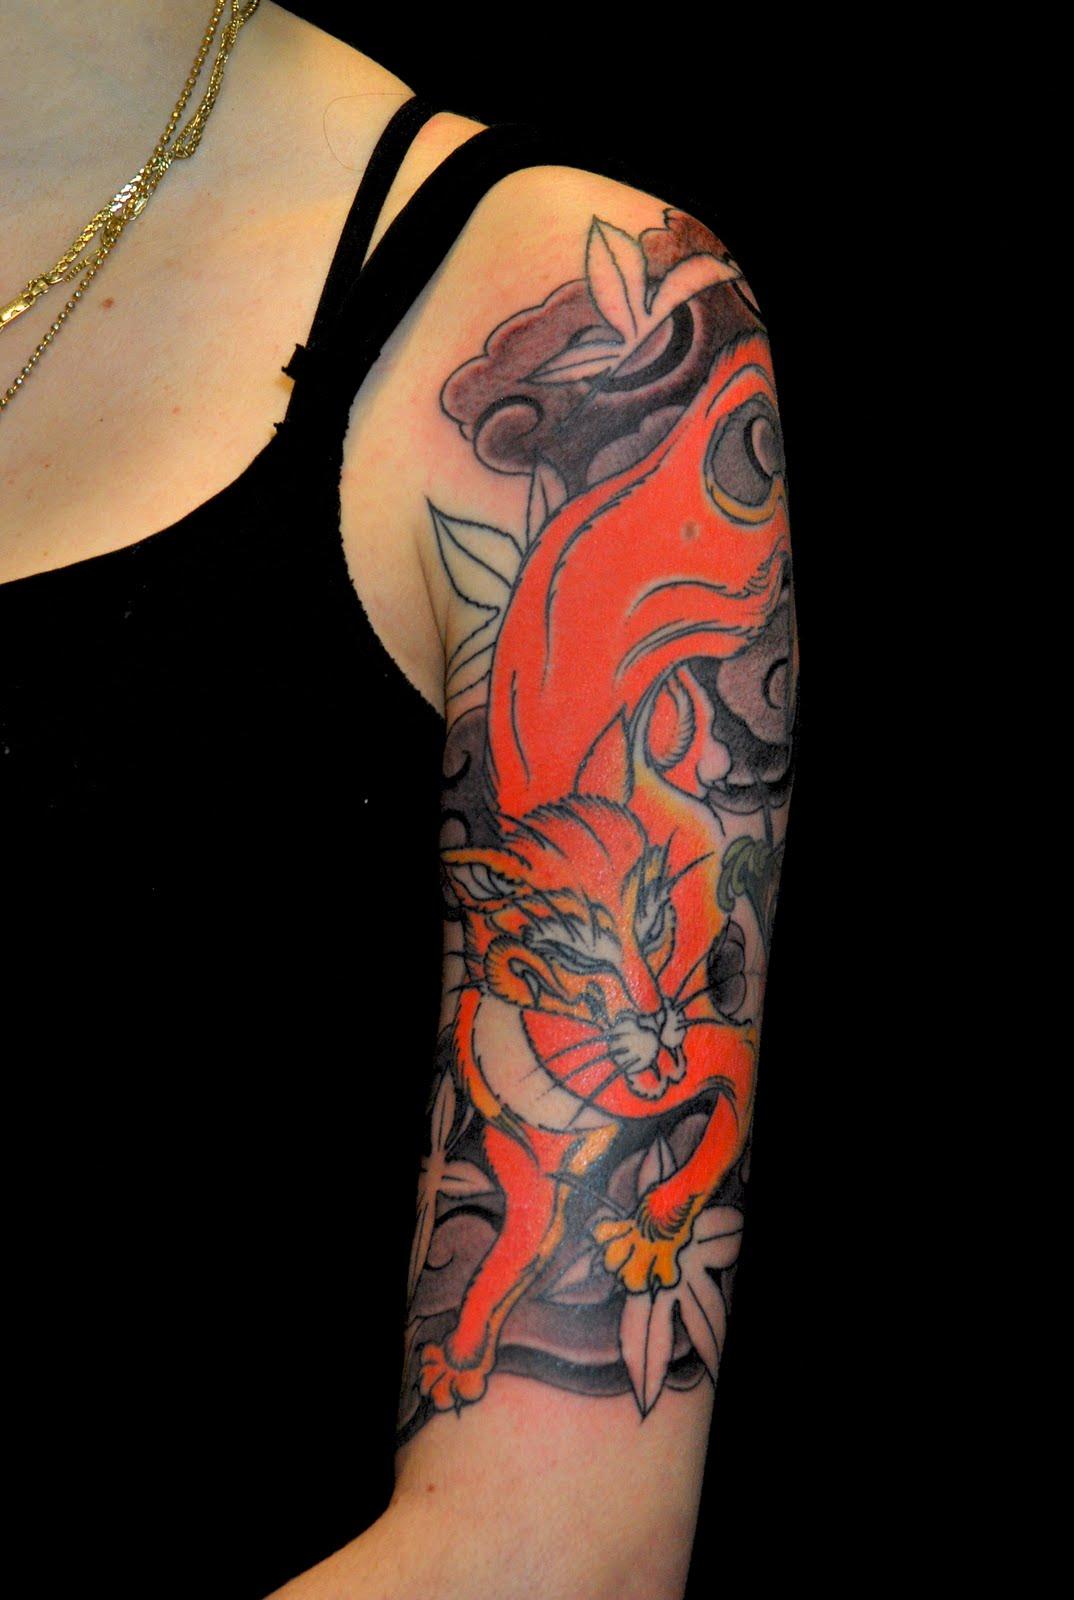 kitsune tattoo idea ink pinterest tattoo ideas tattoo and ideas. Black Bedroom Furniture Sets. Home Design Ideas